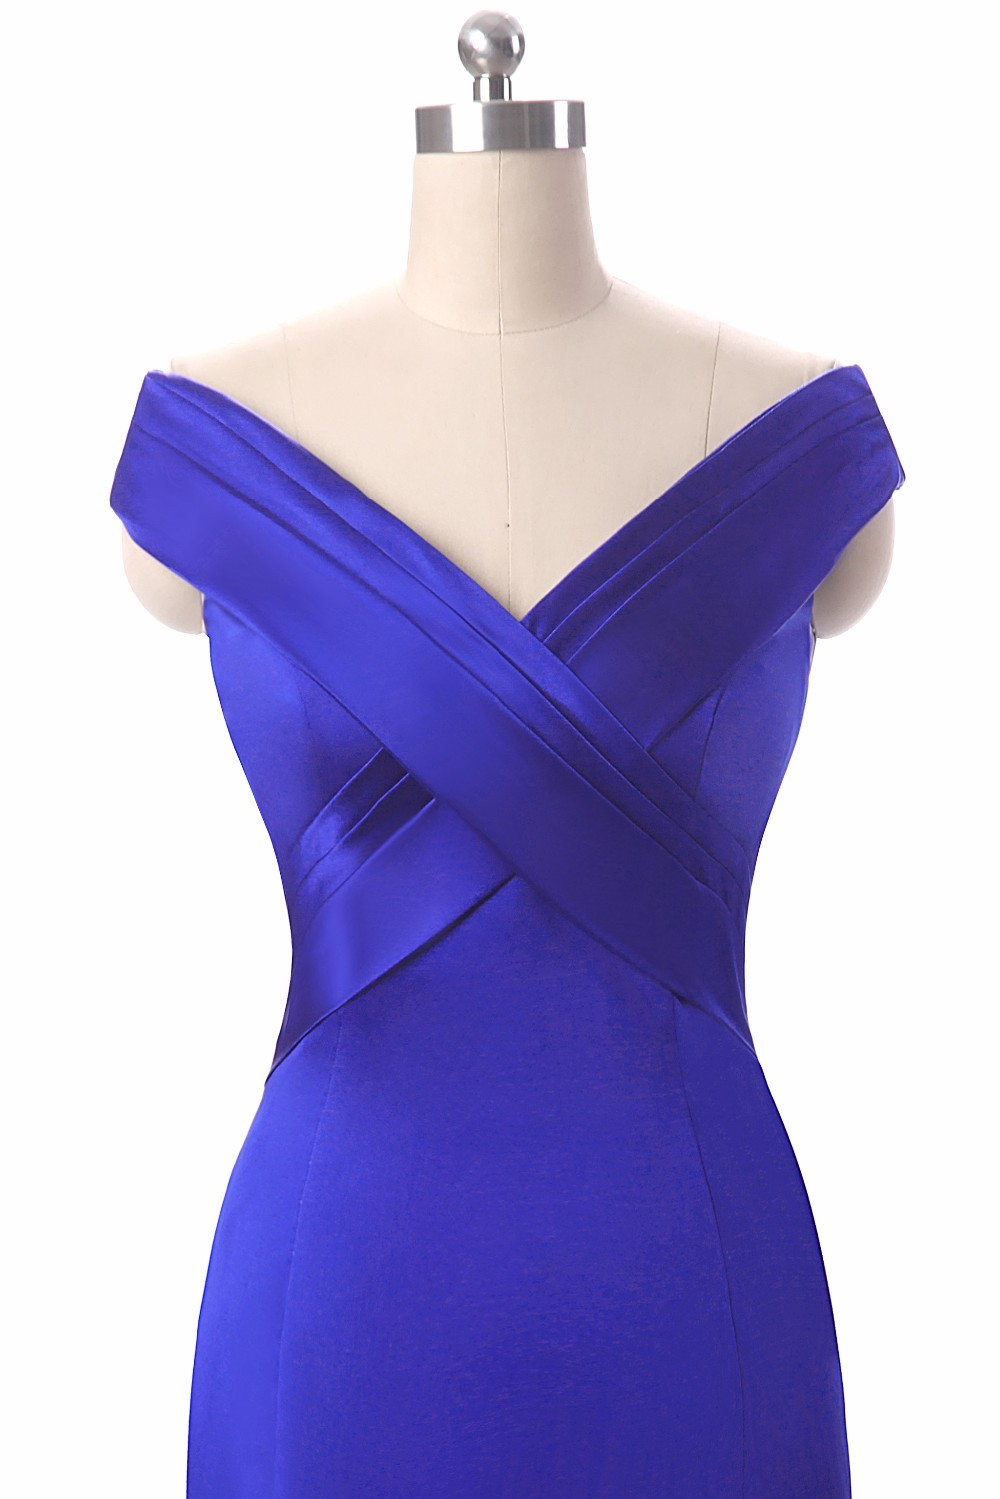 Royal Blue V-Neck Floor Length Mermaid Long Evening Dress 5